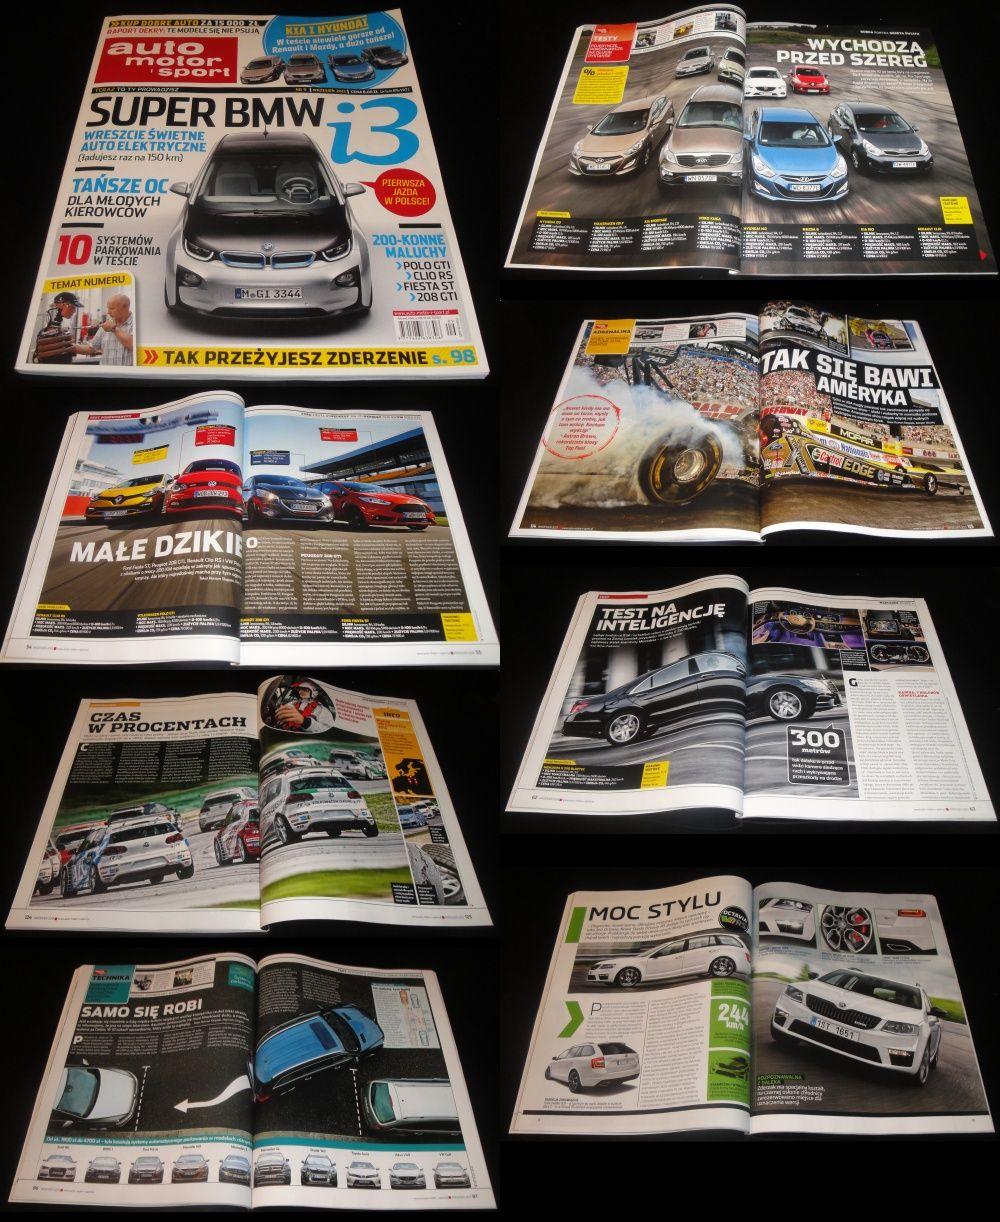 Auto motor i sport 9 2013